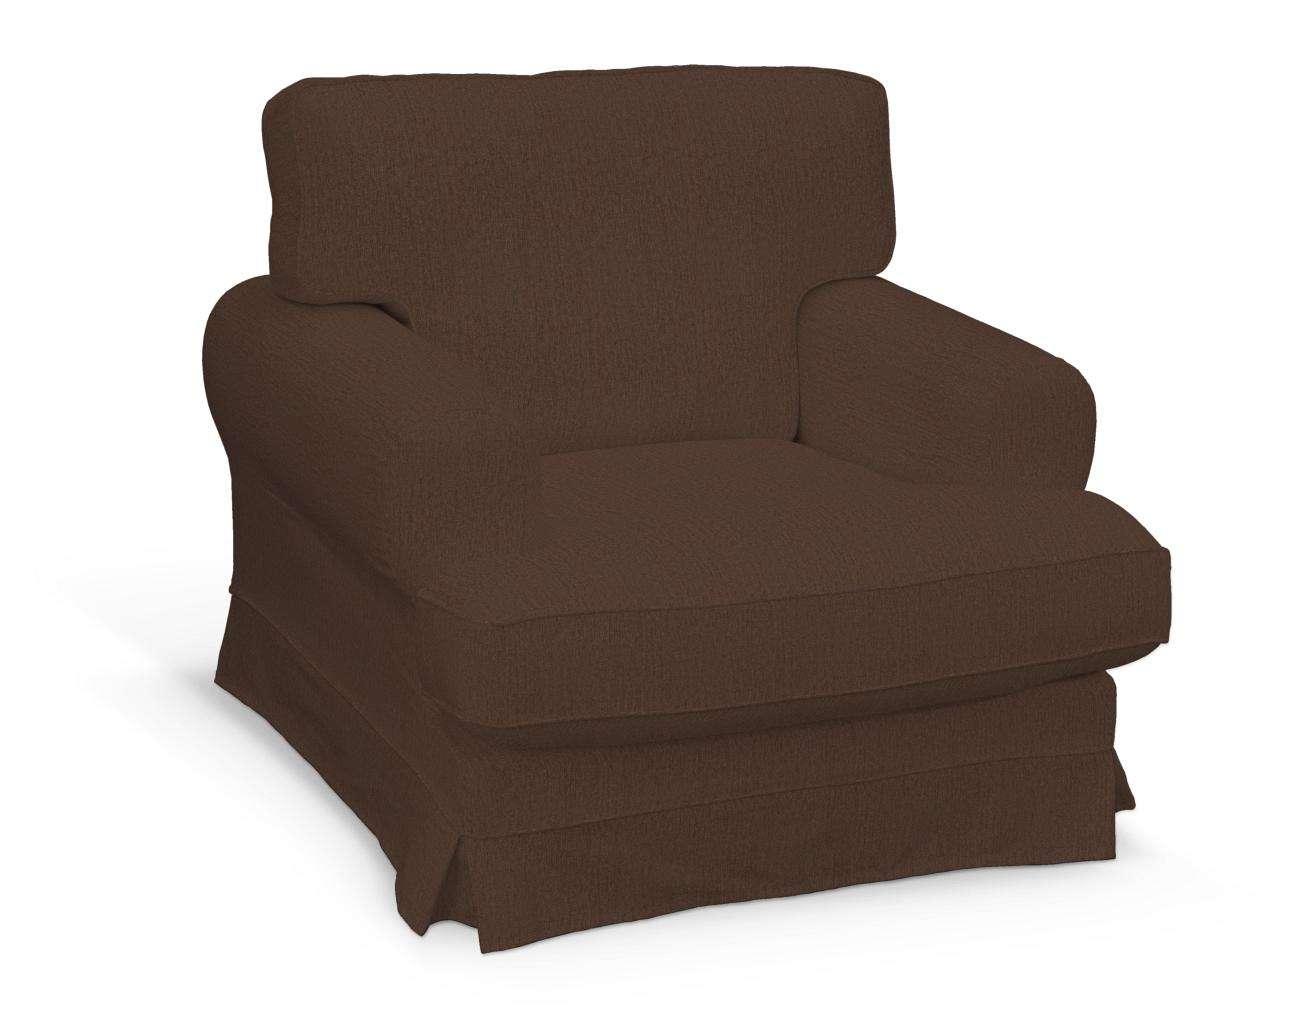 Pokrowiec na fotel Ekeskog Fotel Ekeskog w kolekcji Chenille, tkanina: 702-18